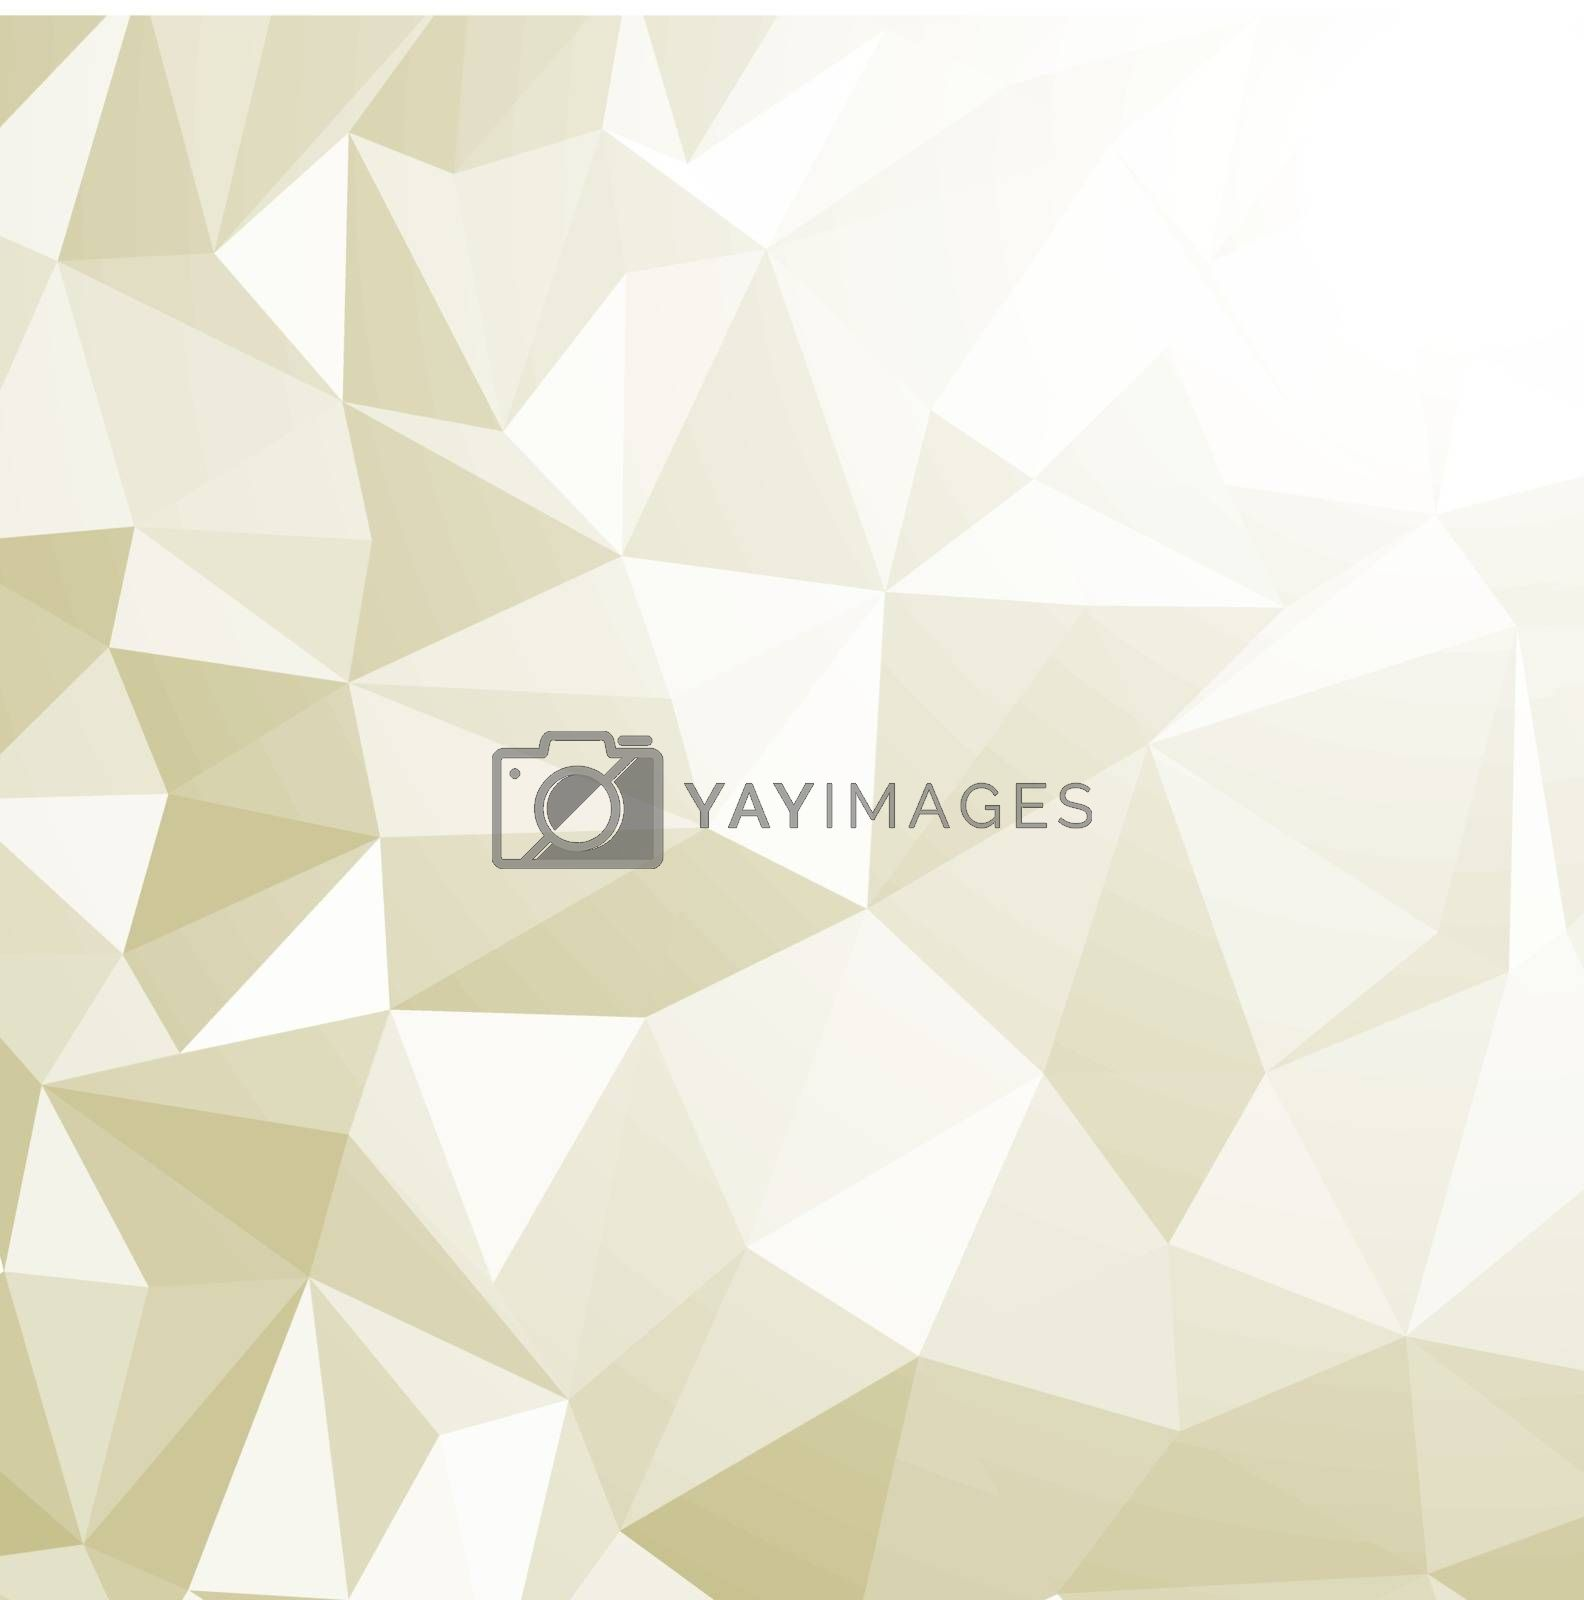 Royalty free image of Old crushed elegant color paper background. EPS 8 by Petrov_Vladimir